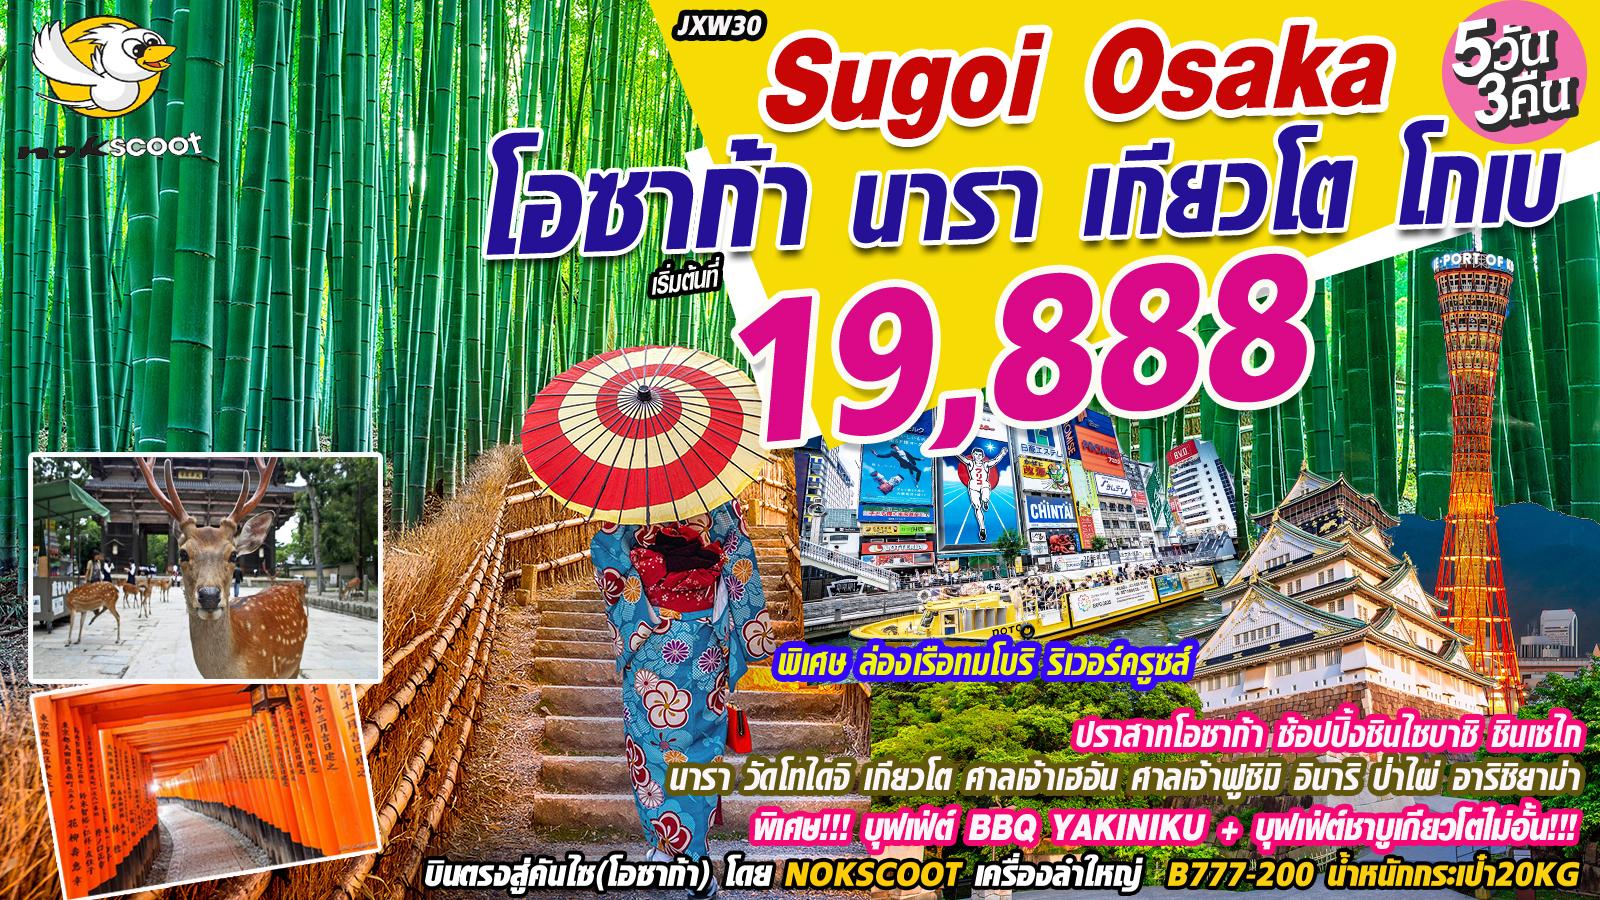 JXW30 Sugoi Osaka โอซาก้า นารา เกียวโต โกเบ 5วัน 3คืน